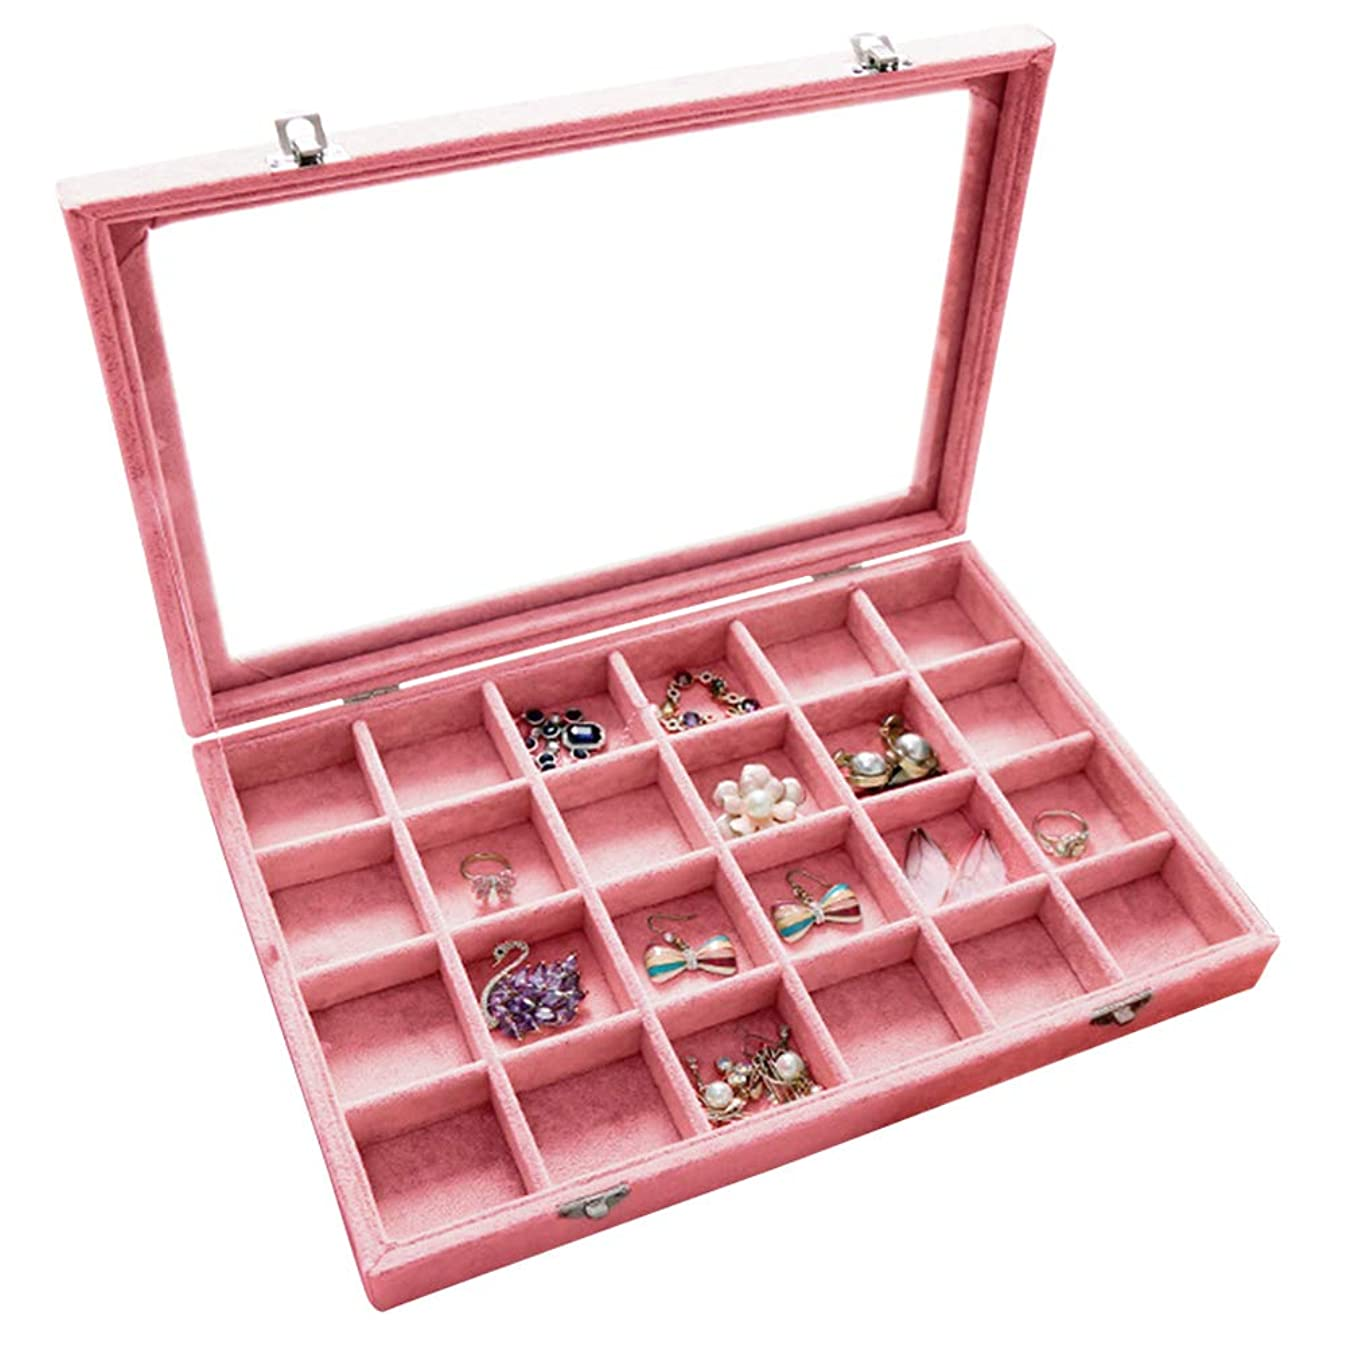 Wuligirl Clear Lid 24 Grid Jewelry Tray Box Showcase Display Storage Rings Earrings Bracelet Necklace Glass Top Lid & Lock(24 Grid)